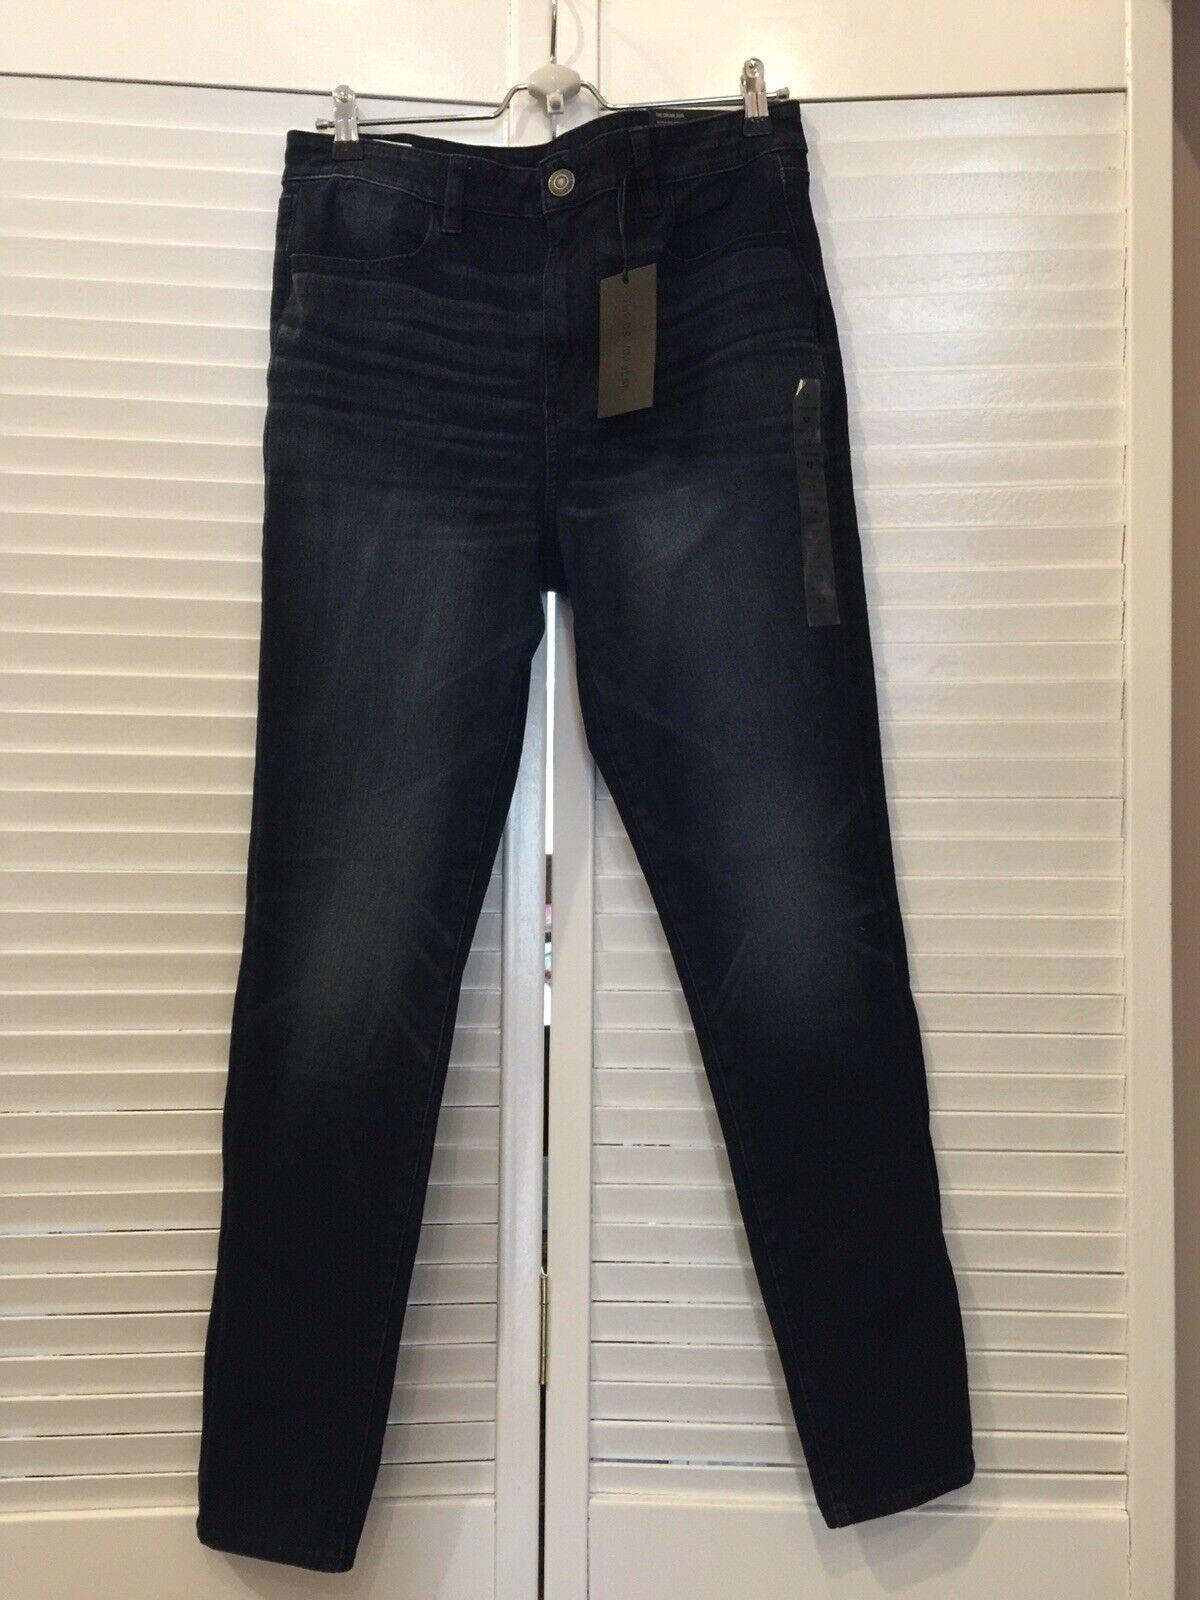 Femme ordinaire de 12 AMERICAN EAGLE OUTFITTERS Jeans Hi-Rise jegging super stretch